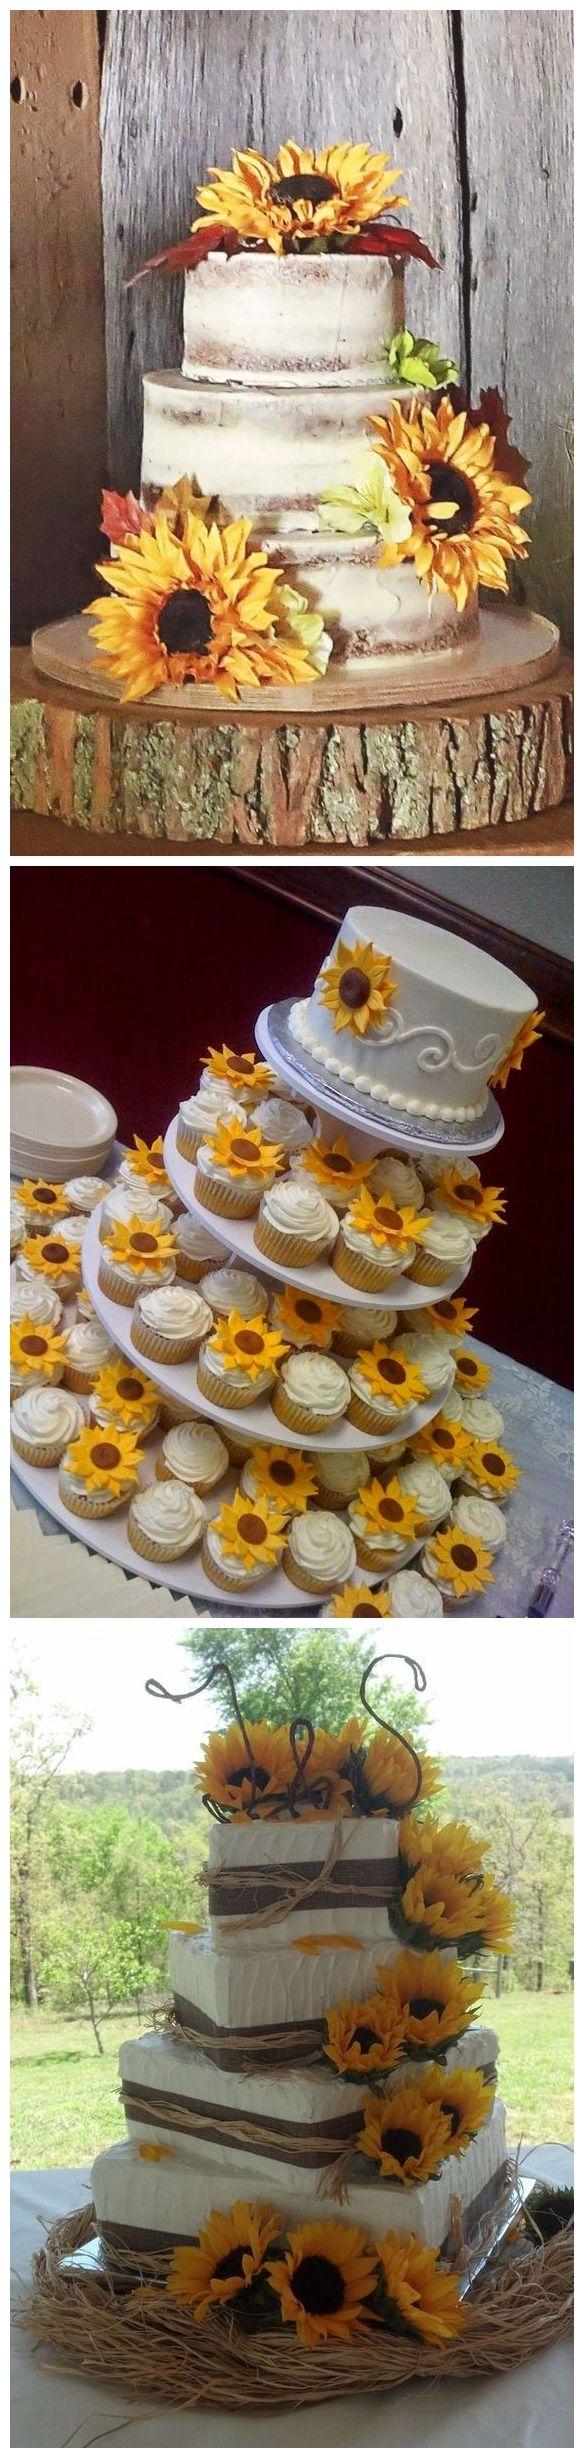 Bold Country Sunflower Wedding ideas #weddings #weddingideas #weddingflowers #cakes